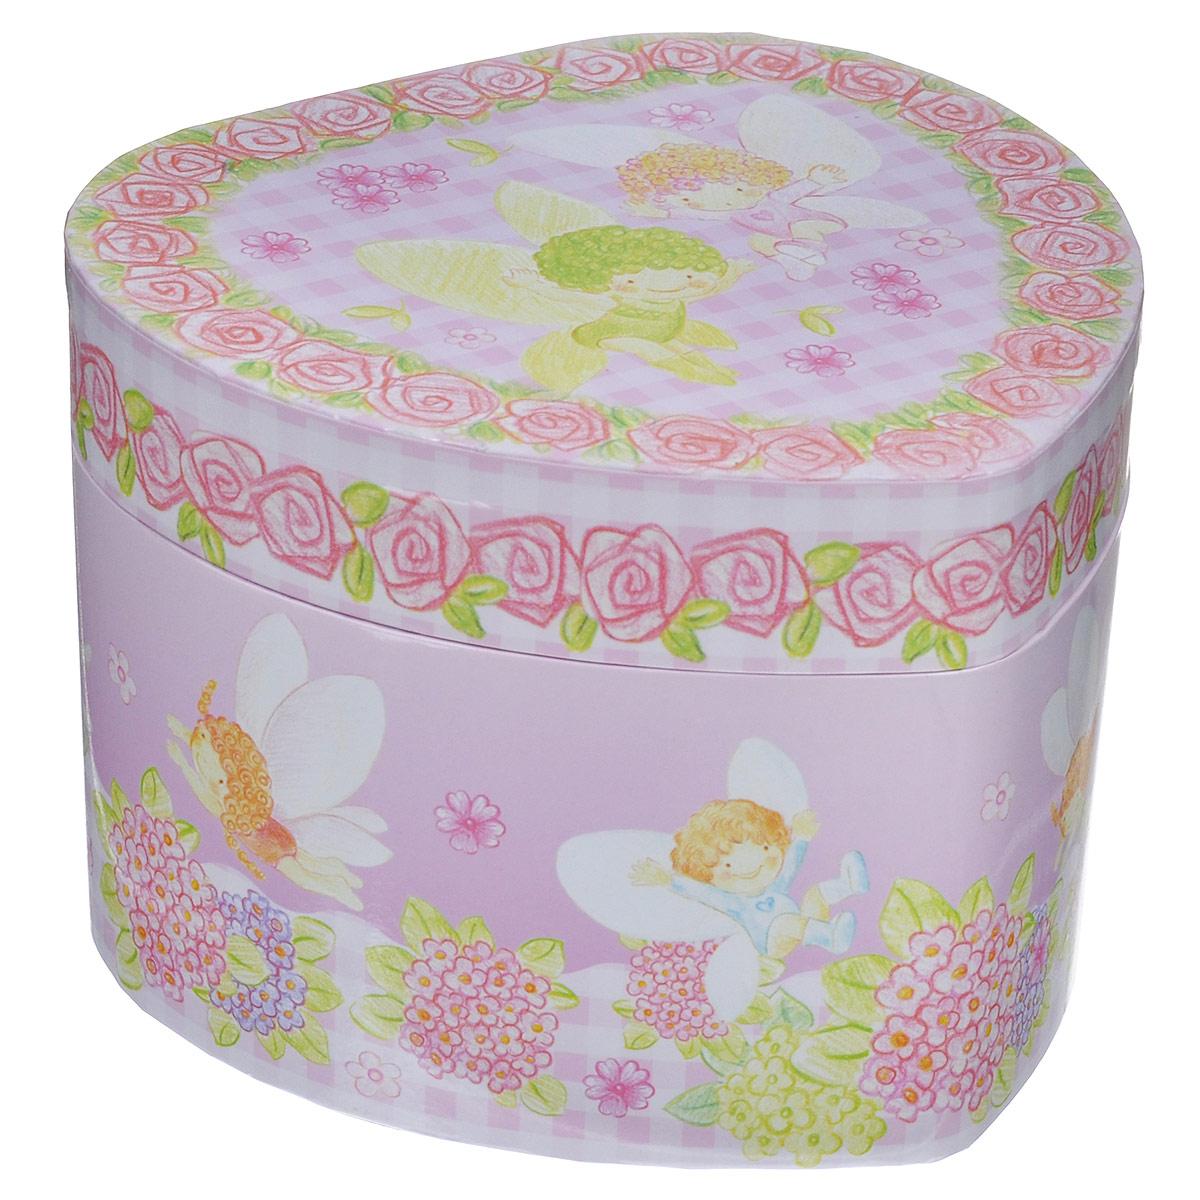 Музыкальная шкатулка Jakos Ангелочки, цвет: розовый